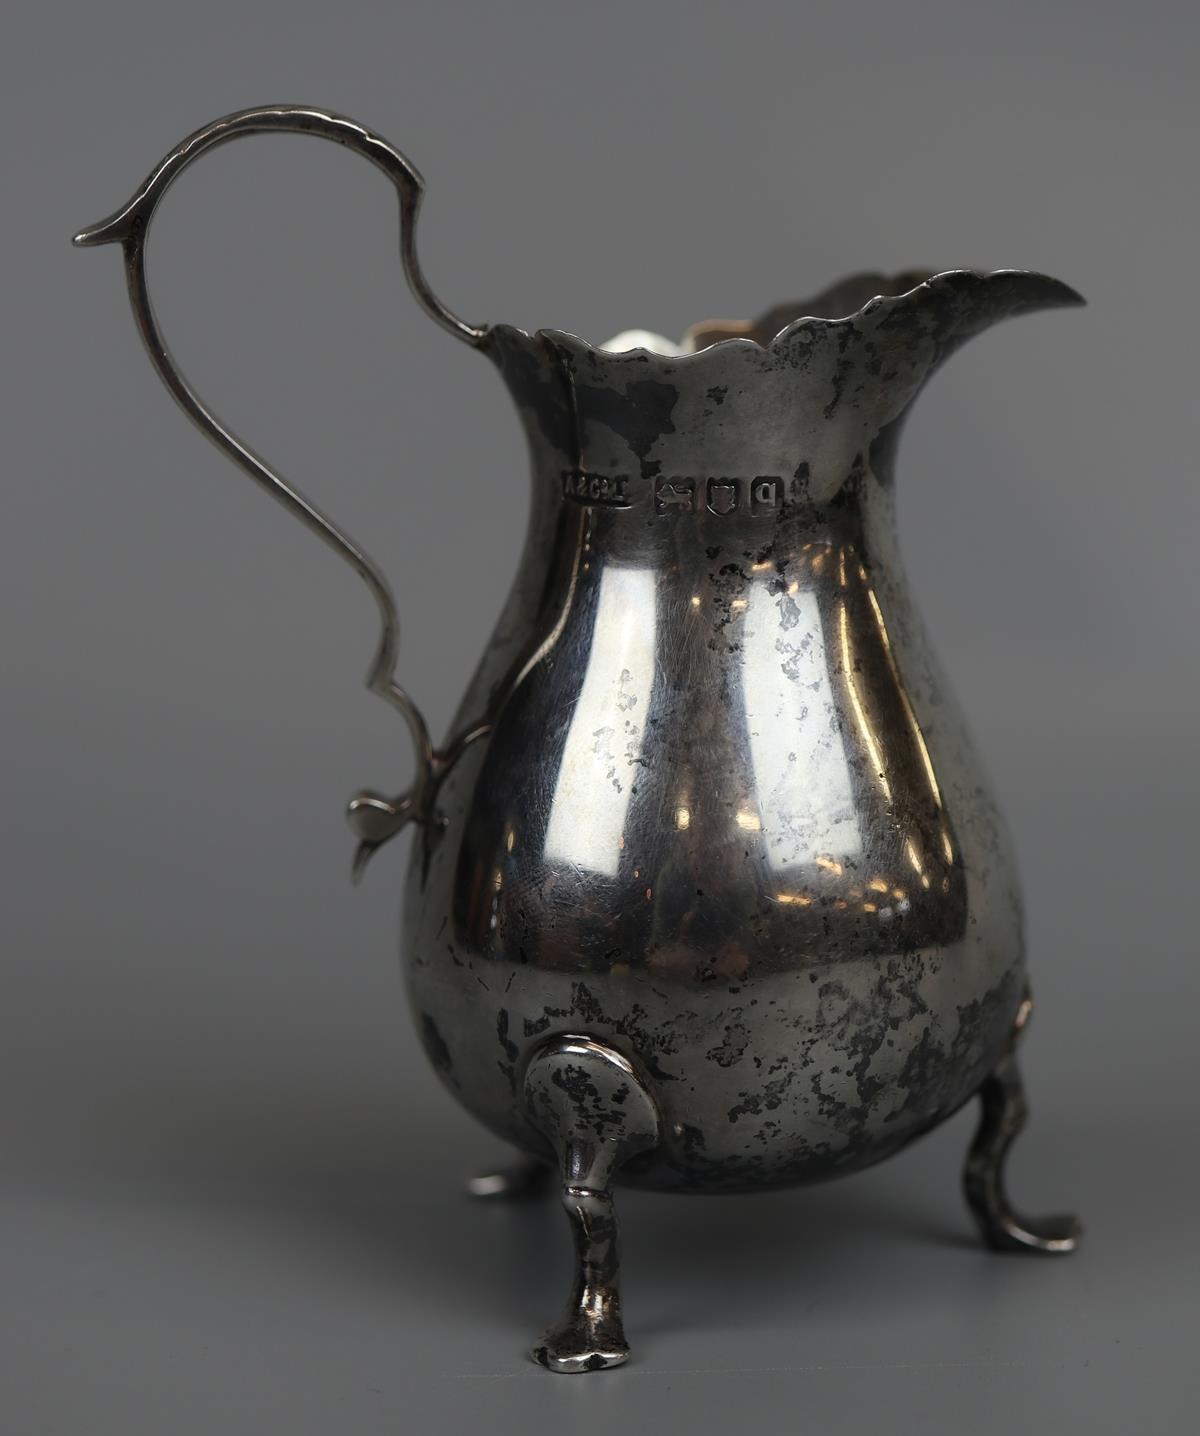 Hallmarked silver cream jug - Asprey & Co LTD - 1911 - Approx 74g